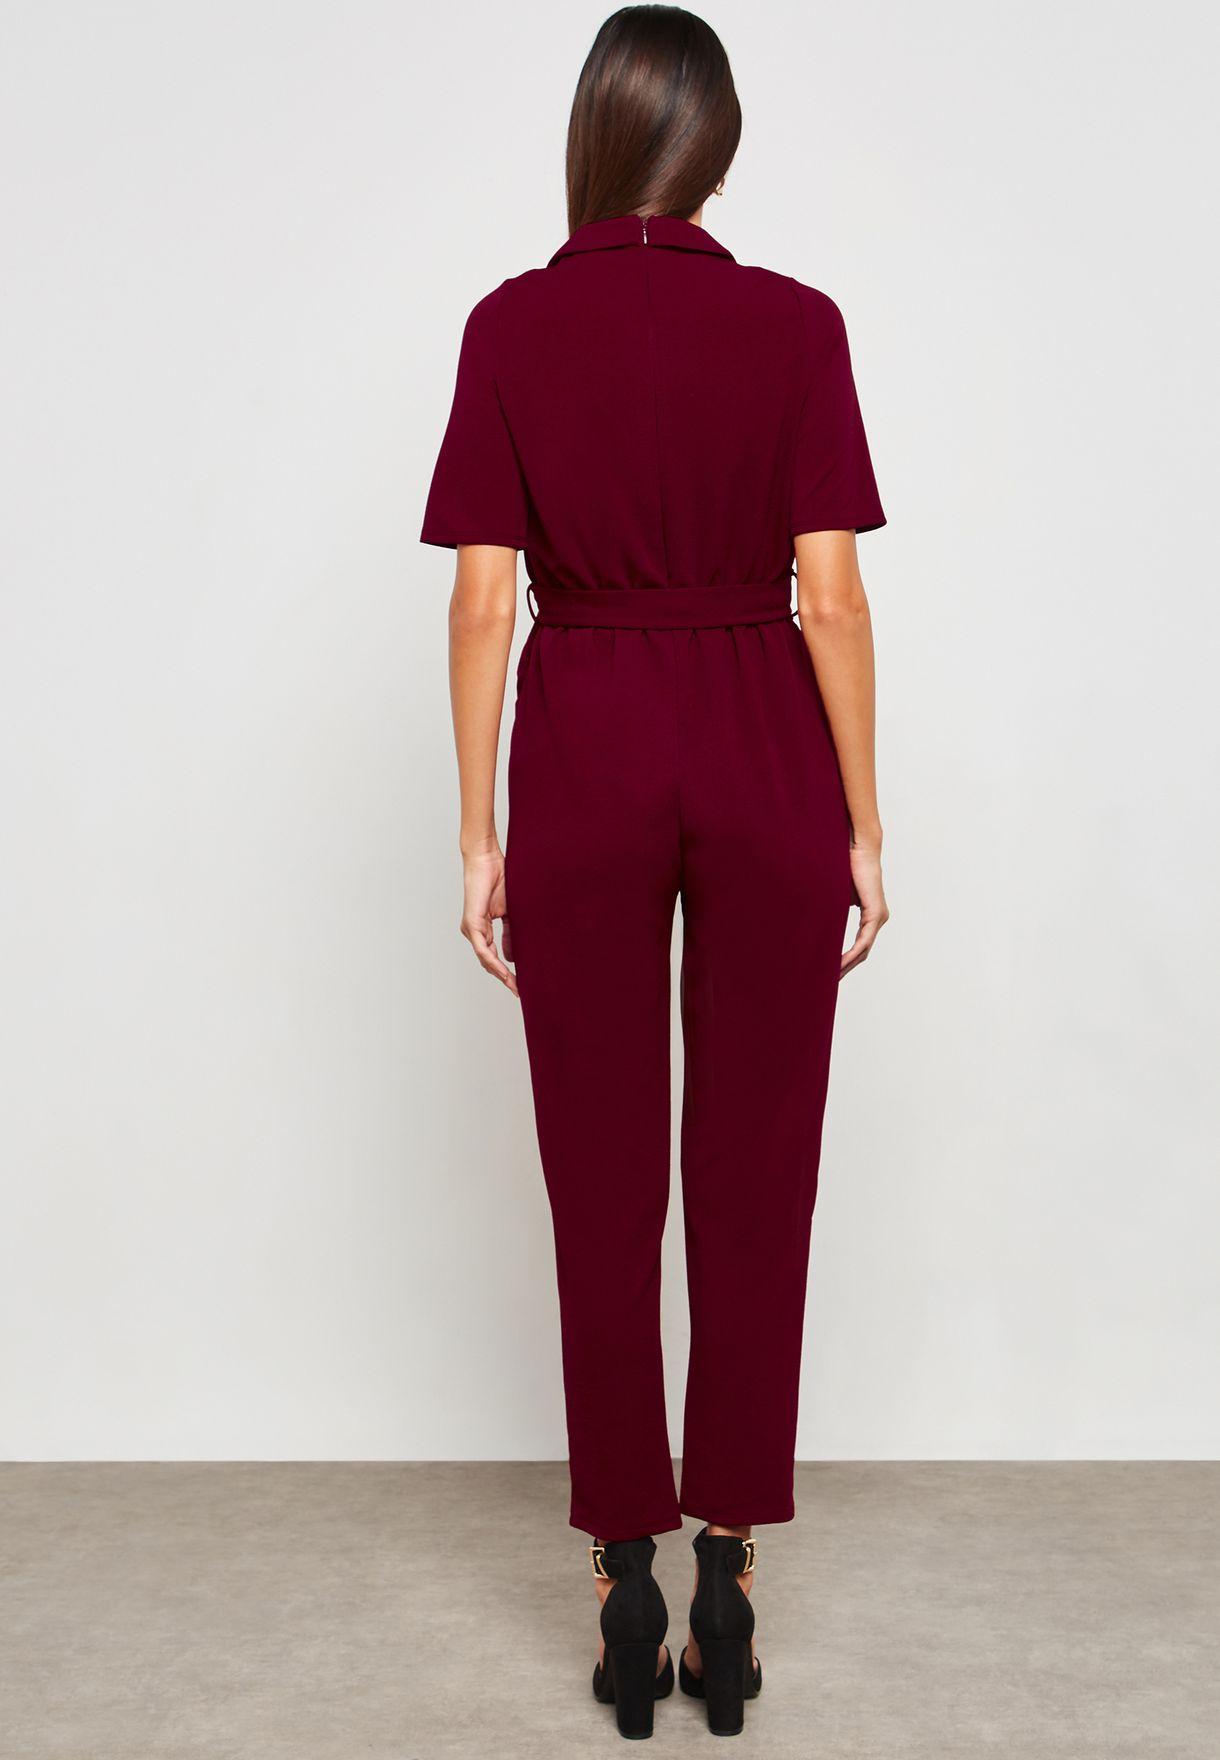 0b74a3d483fac Shop Dorothy Perkins Maternity red Tie Waist Wrap Jumpsuit 17383812 ...